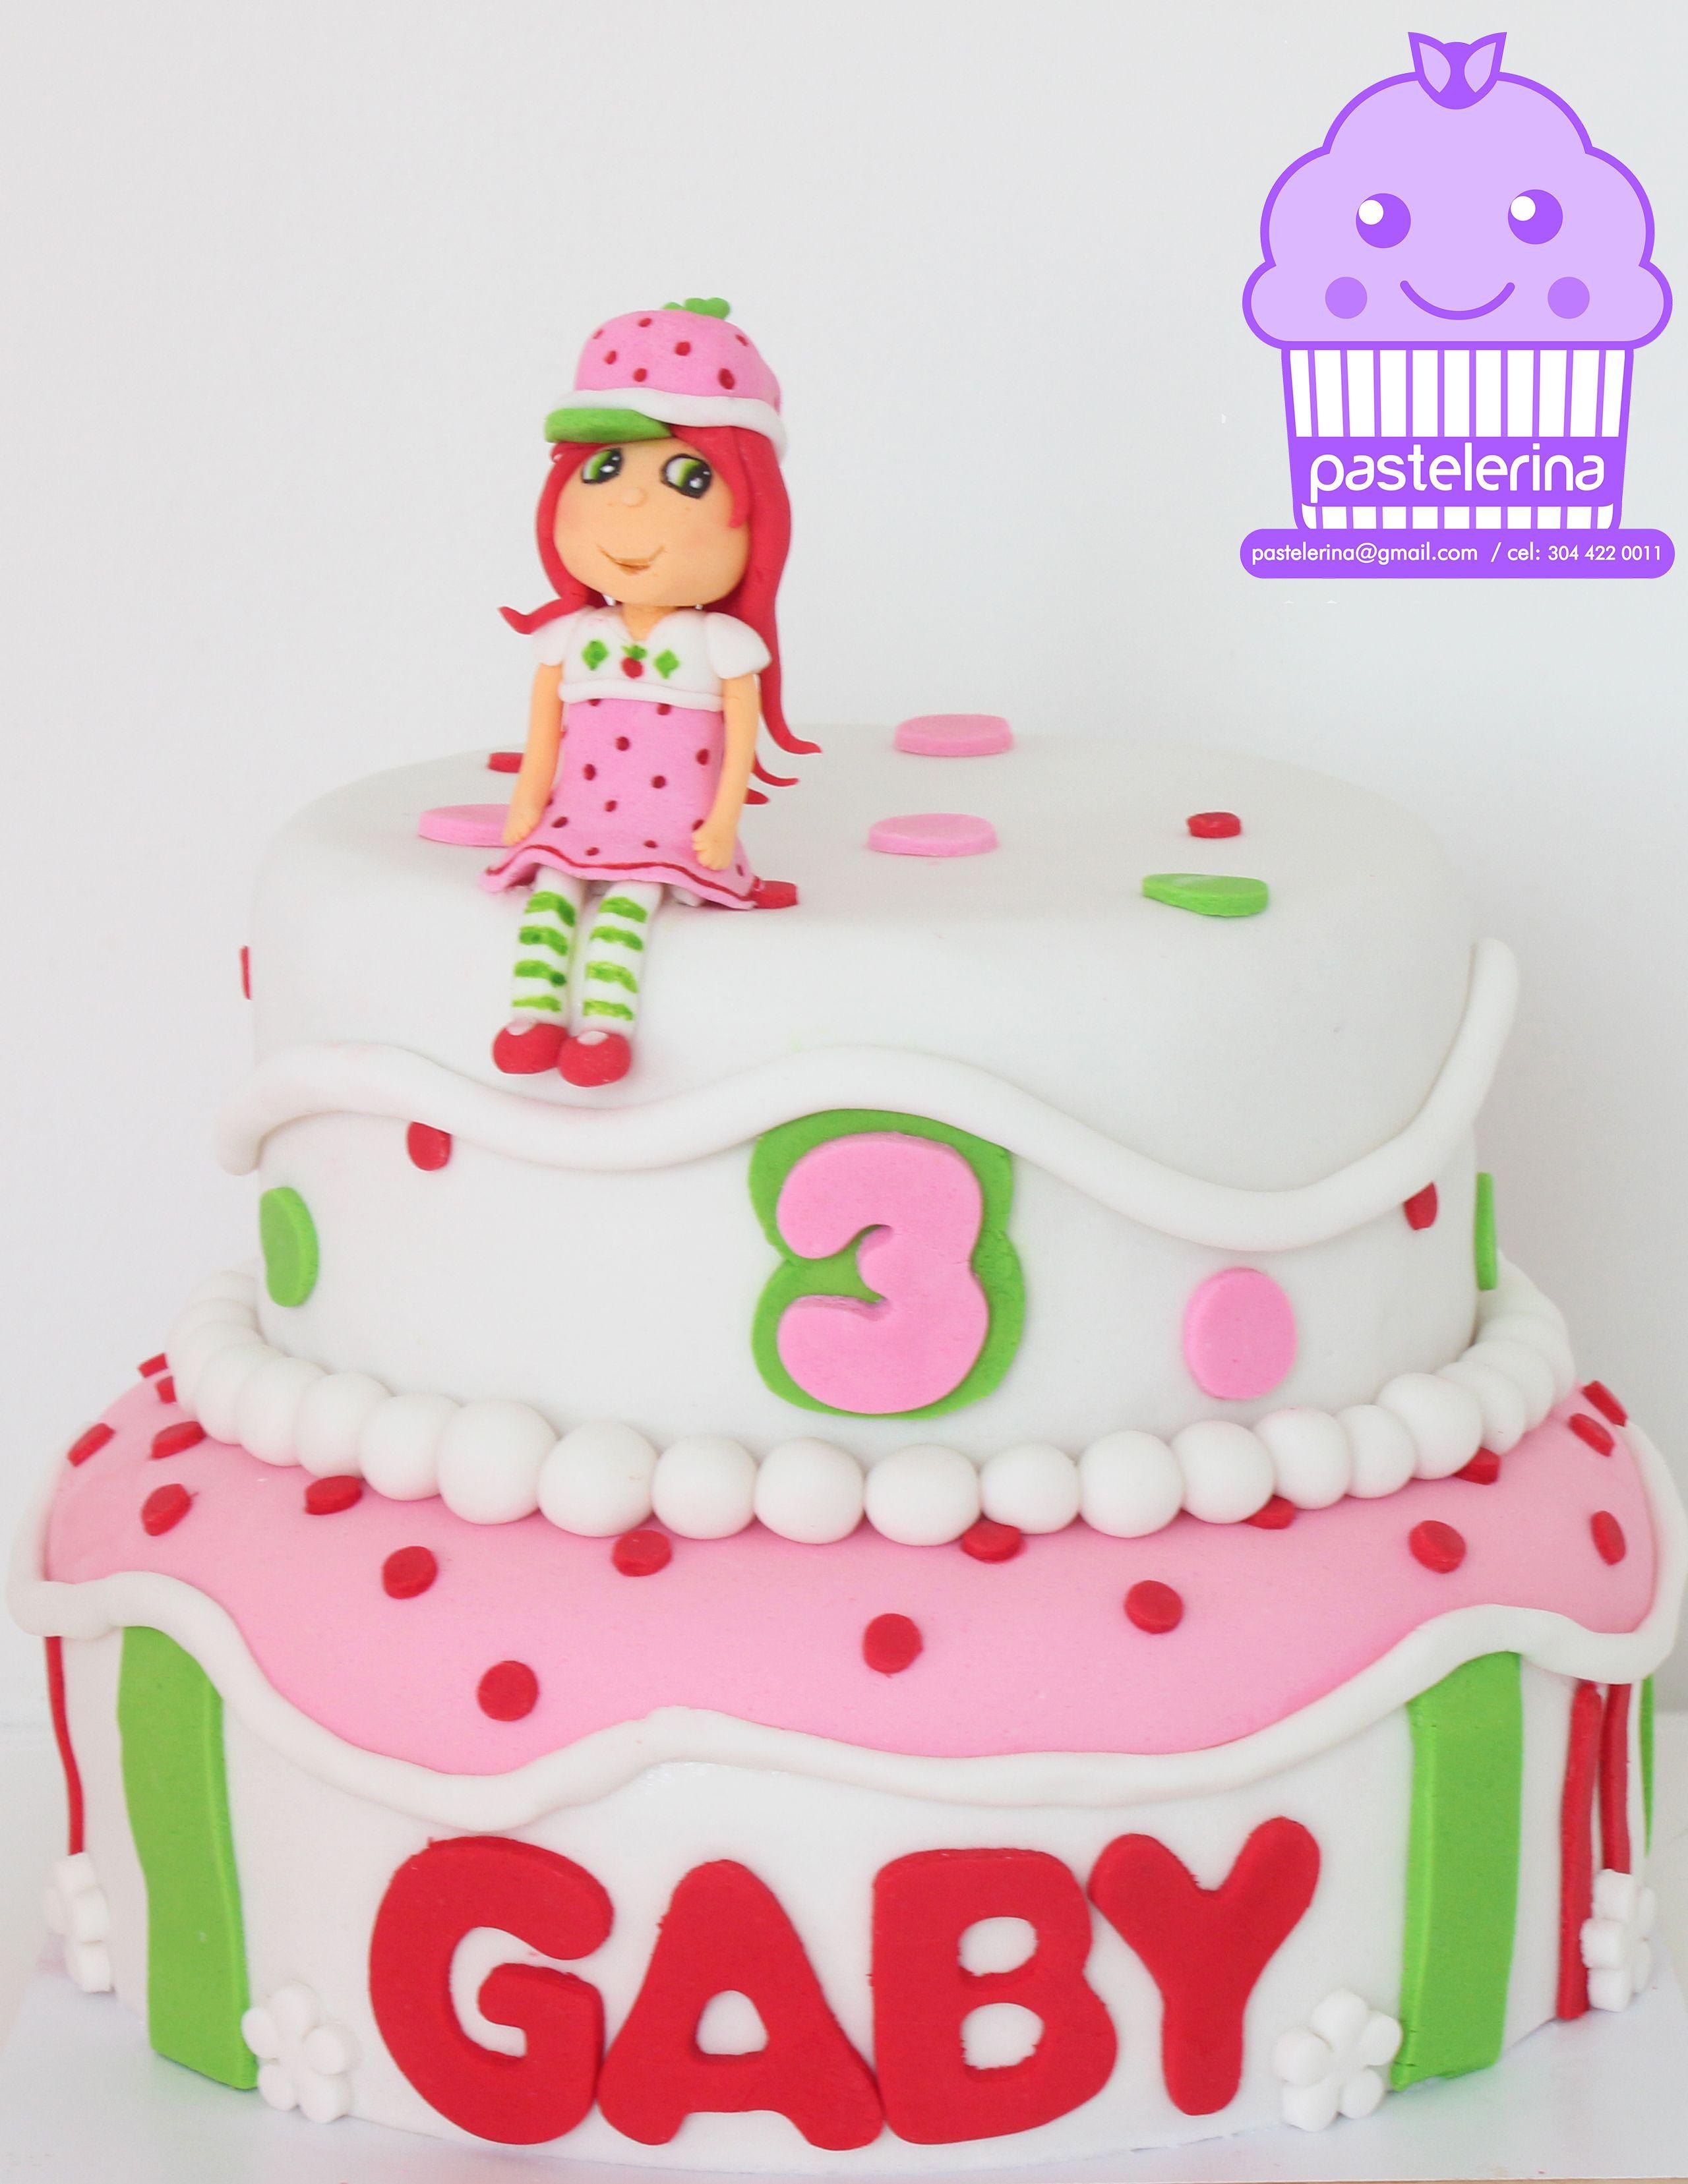 Strawberry shortcake cake Torta Rosita Fresita